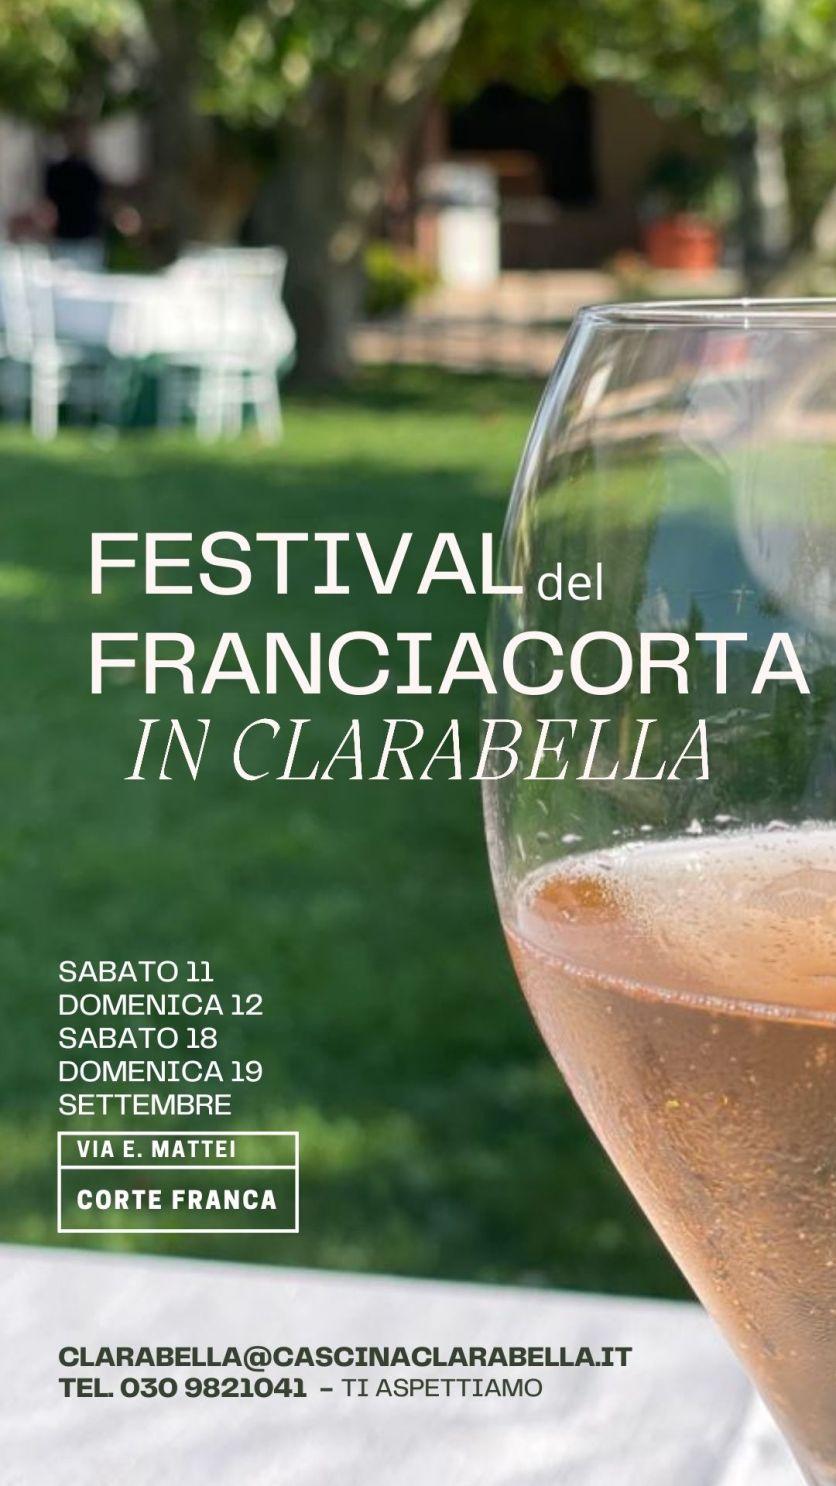 Festival Franciacorta in Clarabella